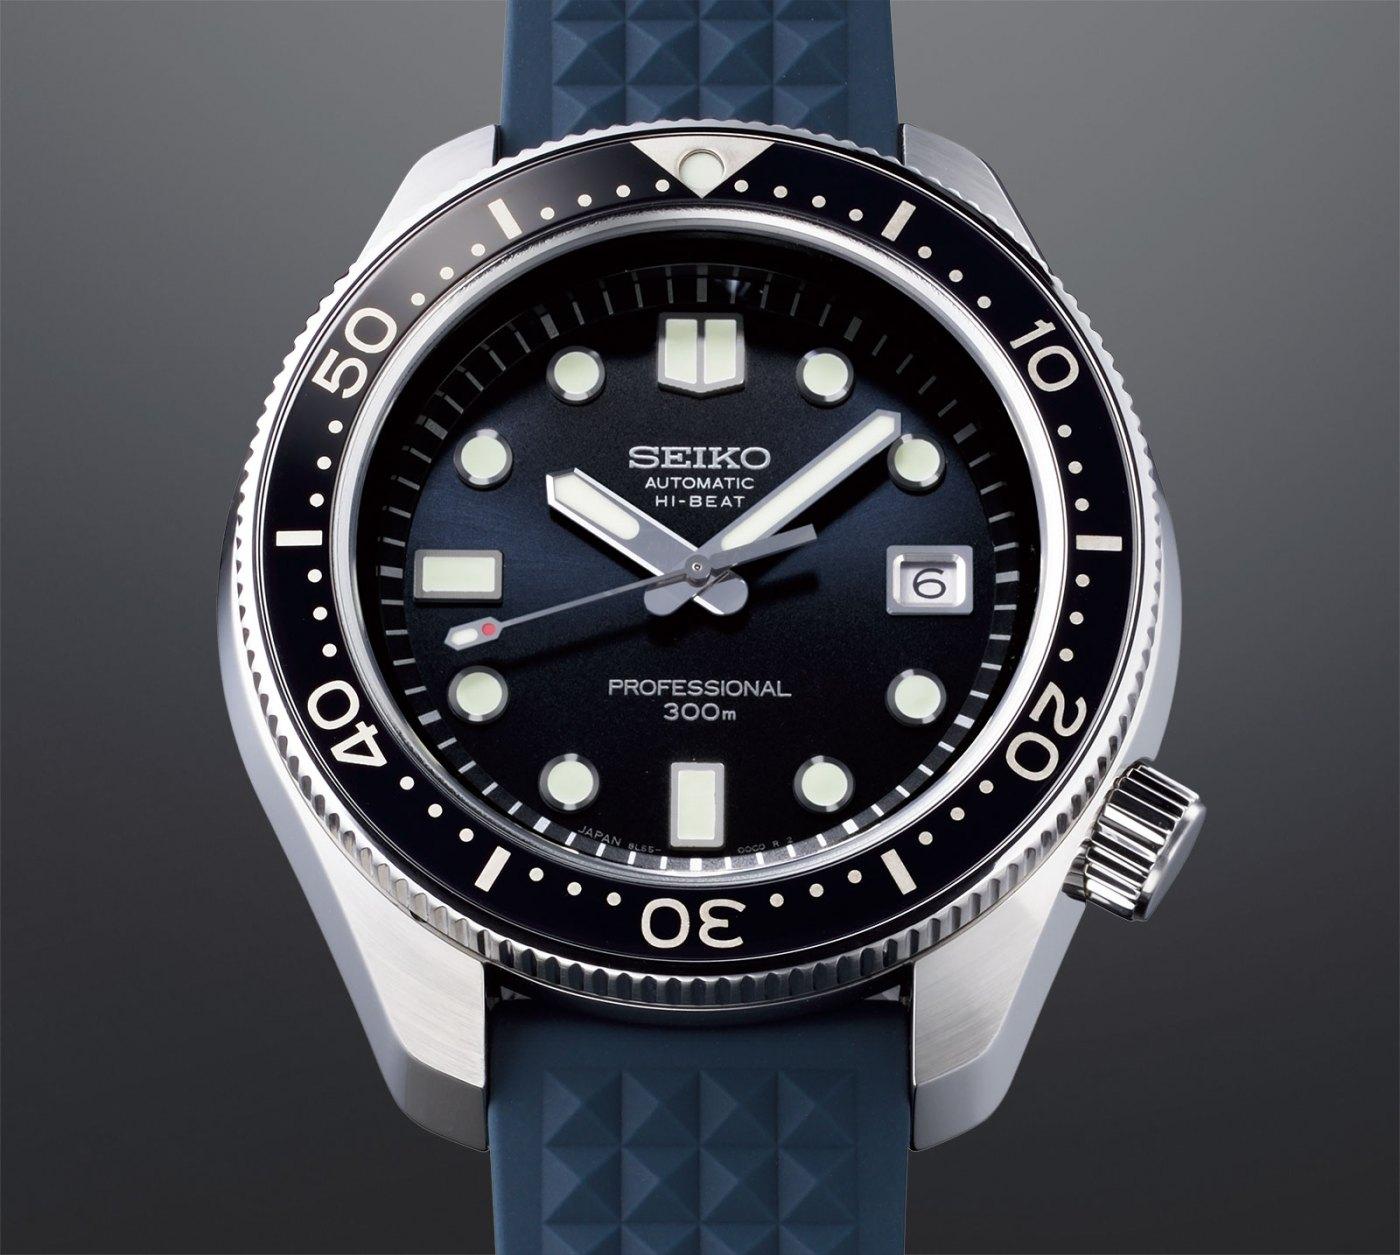 2020 Seiko 1968 Professional Divers 300M remake Ref. SLA039